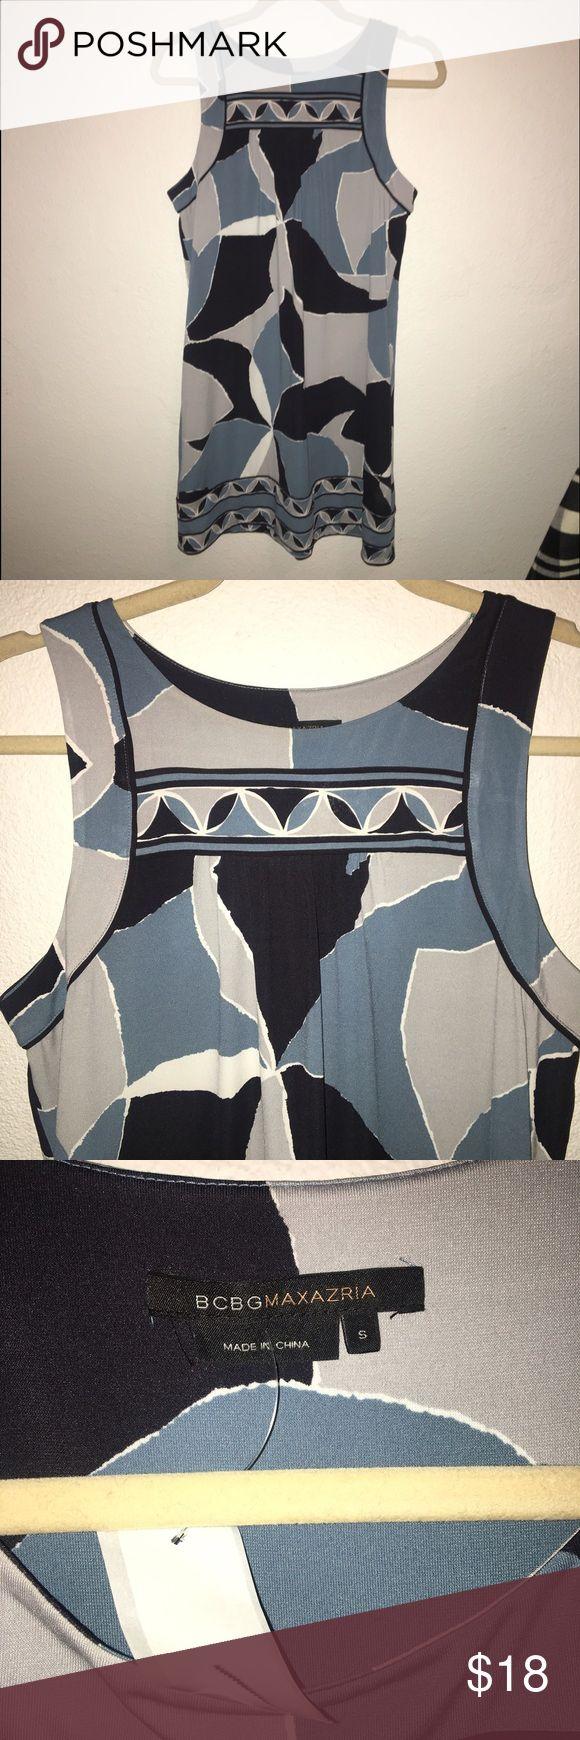 🎀NEW BCBG jersey geometric print shift dress🎀 brand new. bcbgmaxazria. blue/grey geometric print. jersey fabric. BCBGMaxAzria Dresses Mini